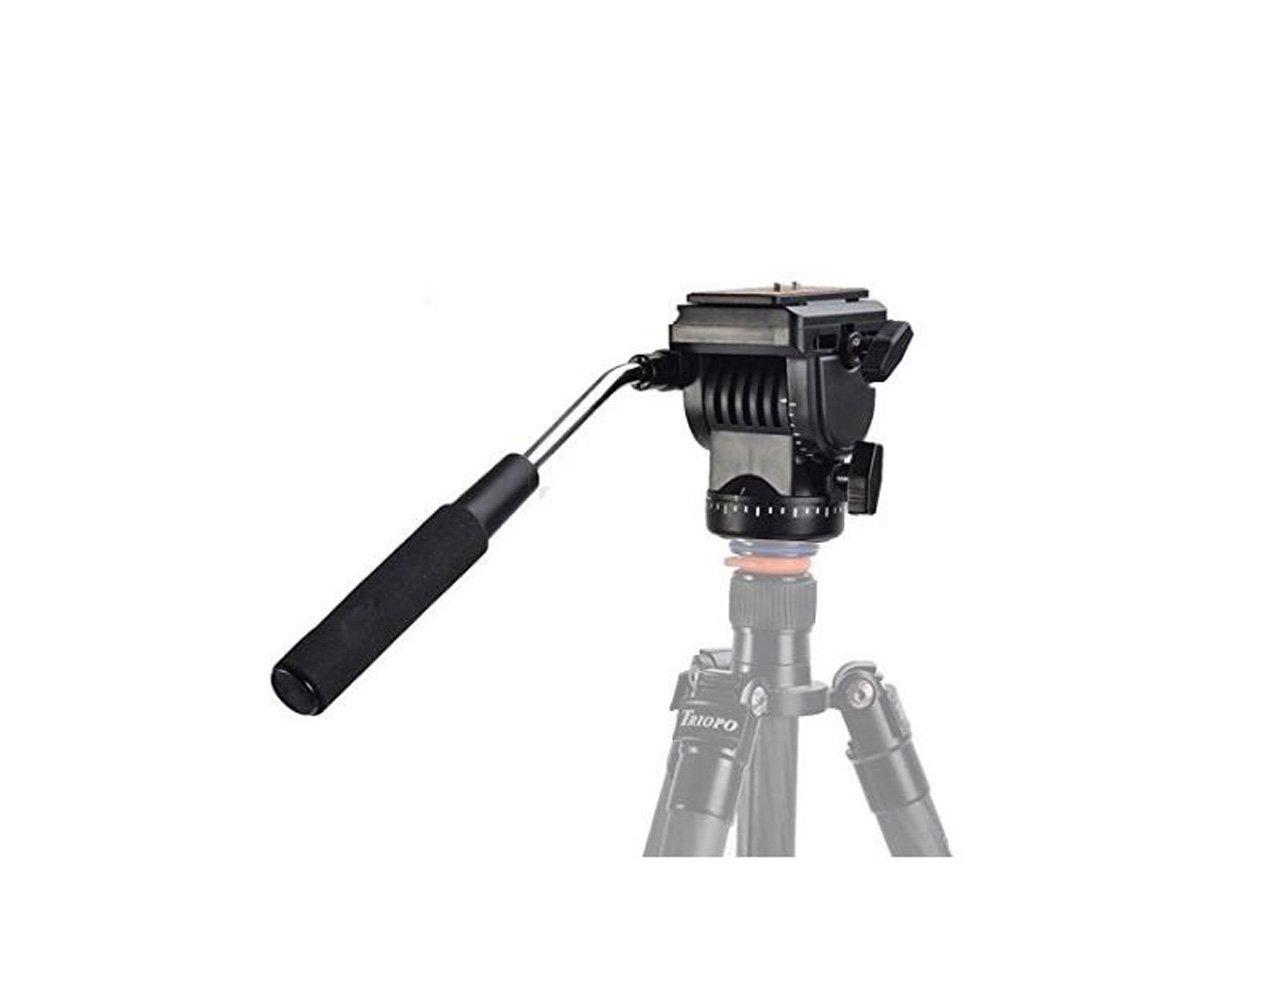 Buy E Image Ek60aam Fluid Drag Video Head And Tripod E Image Ek60aam